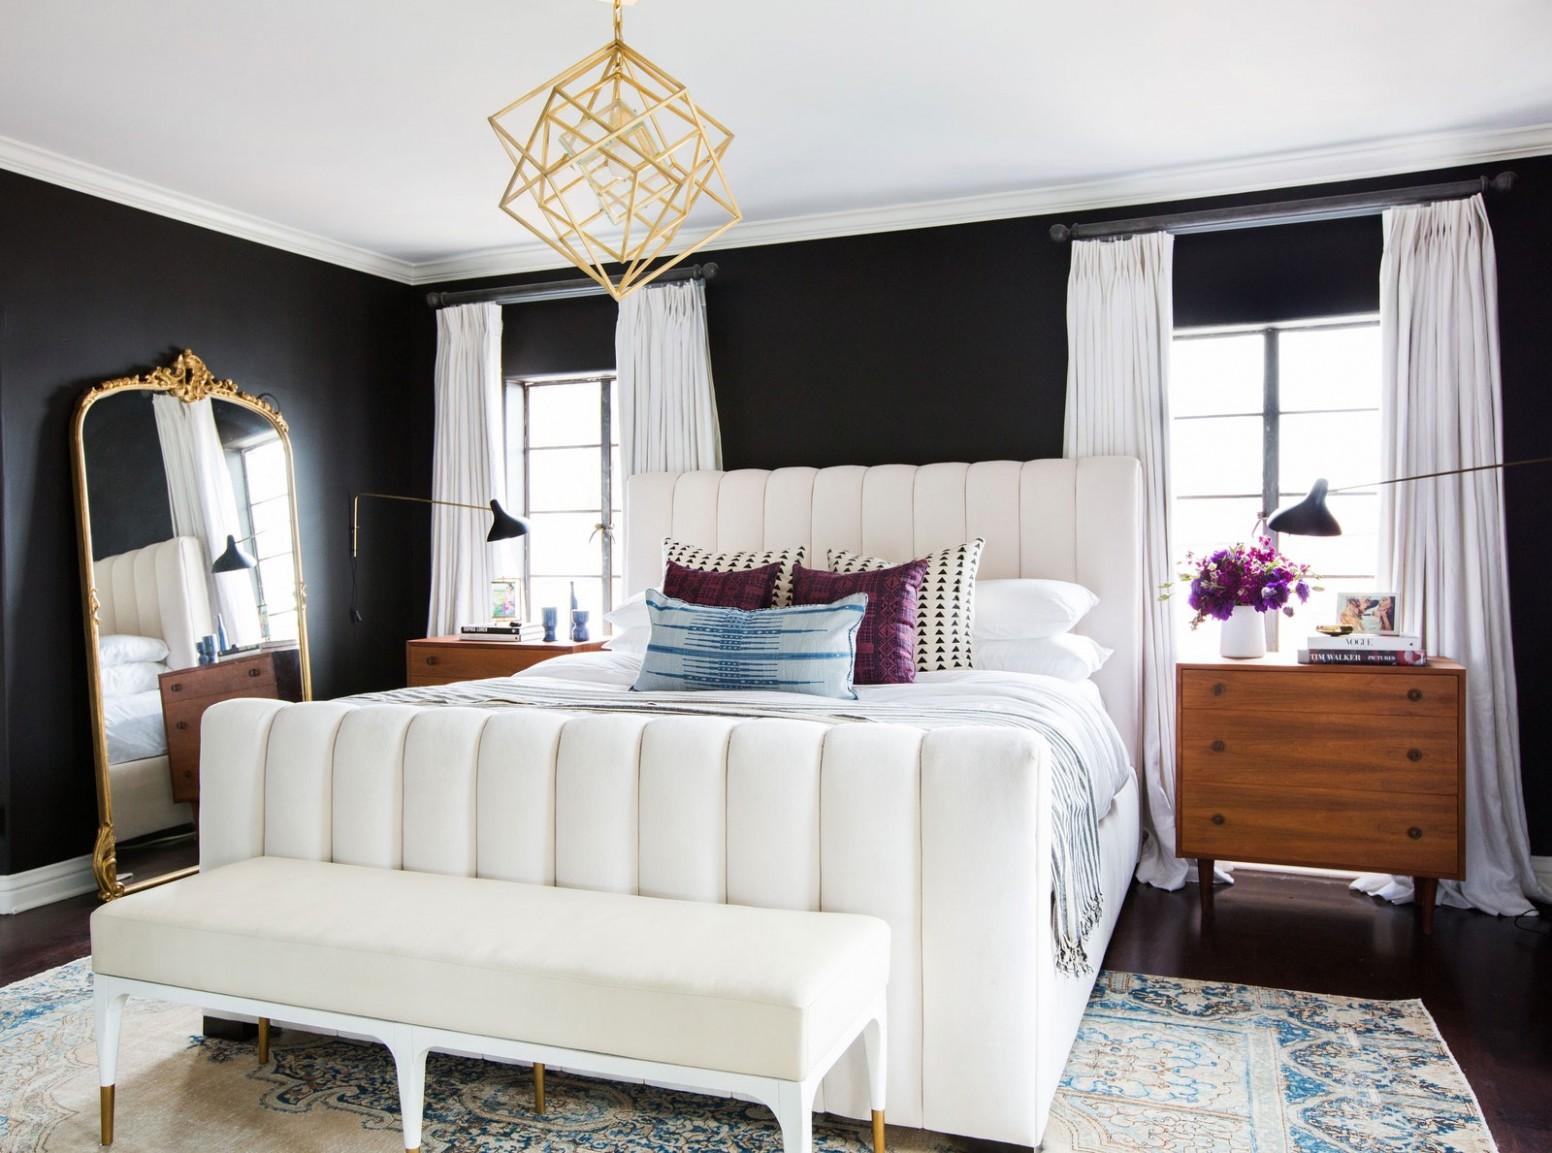 9 Master Bedroom Decorating Ideas and Design Inspiration  - Bedroom Ideas Master